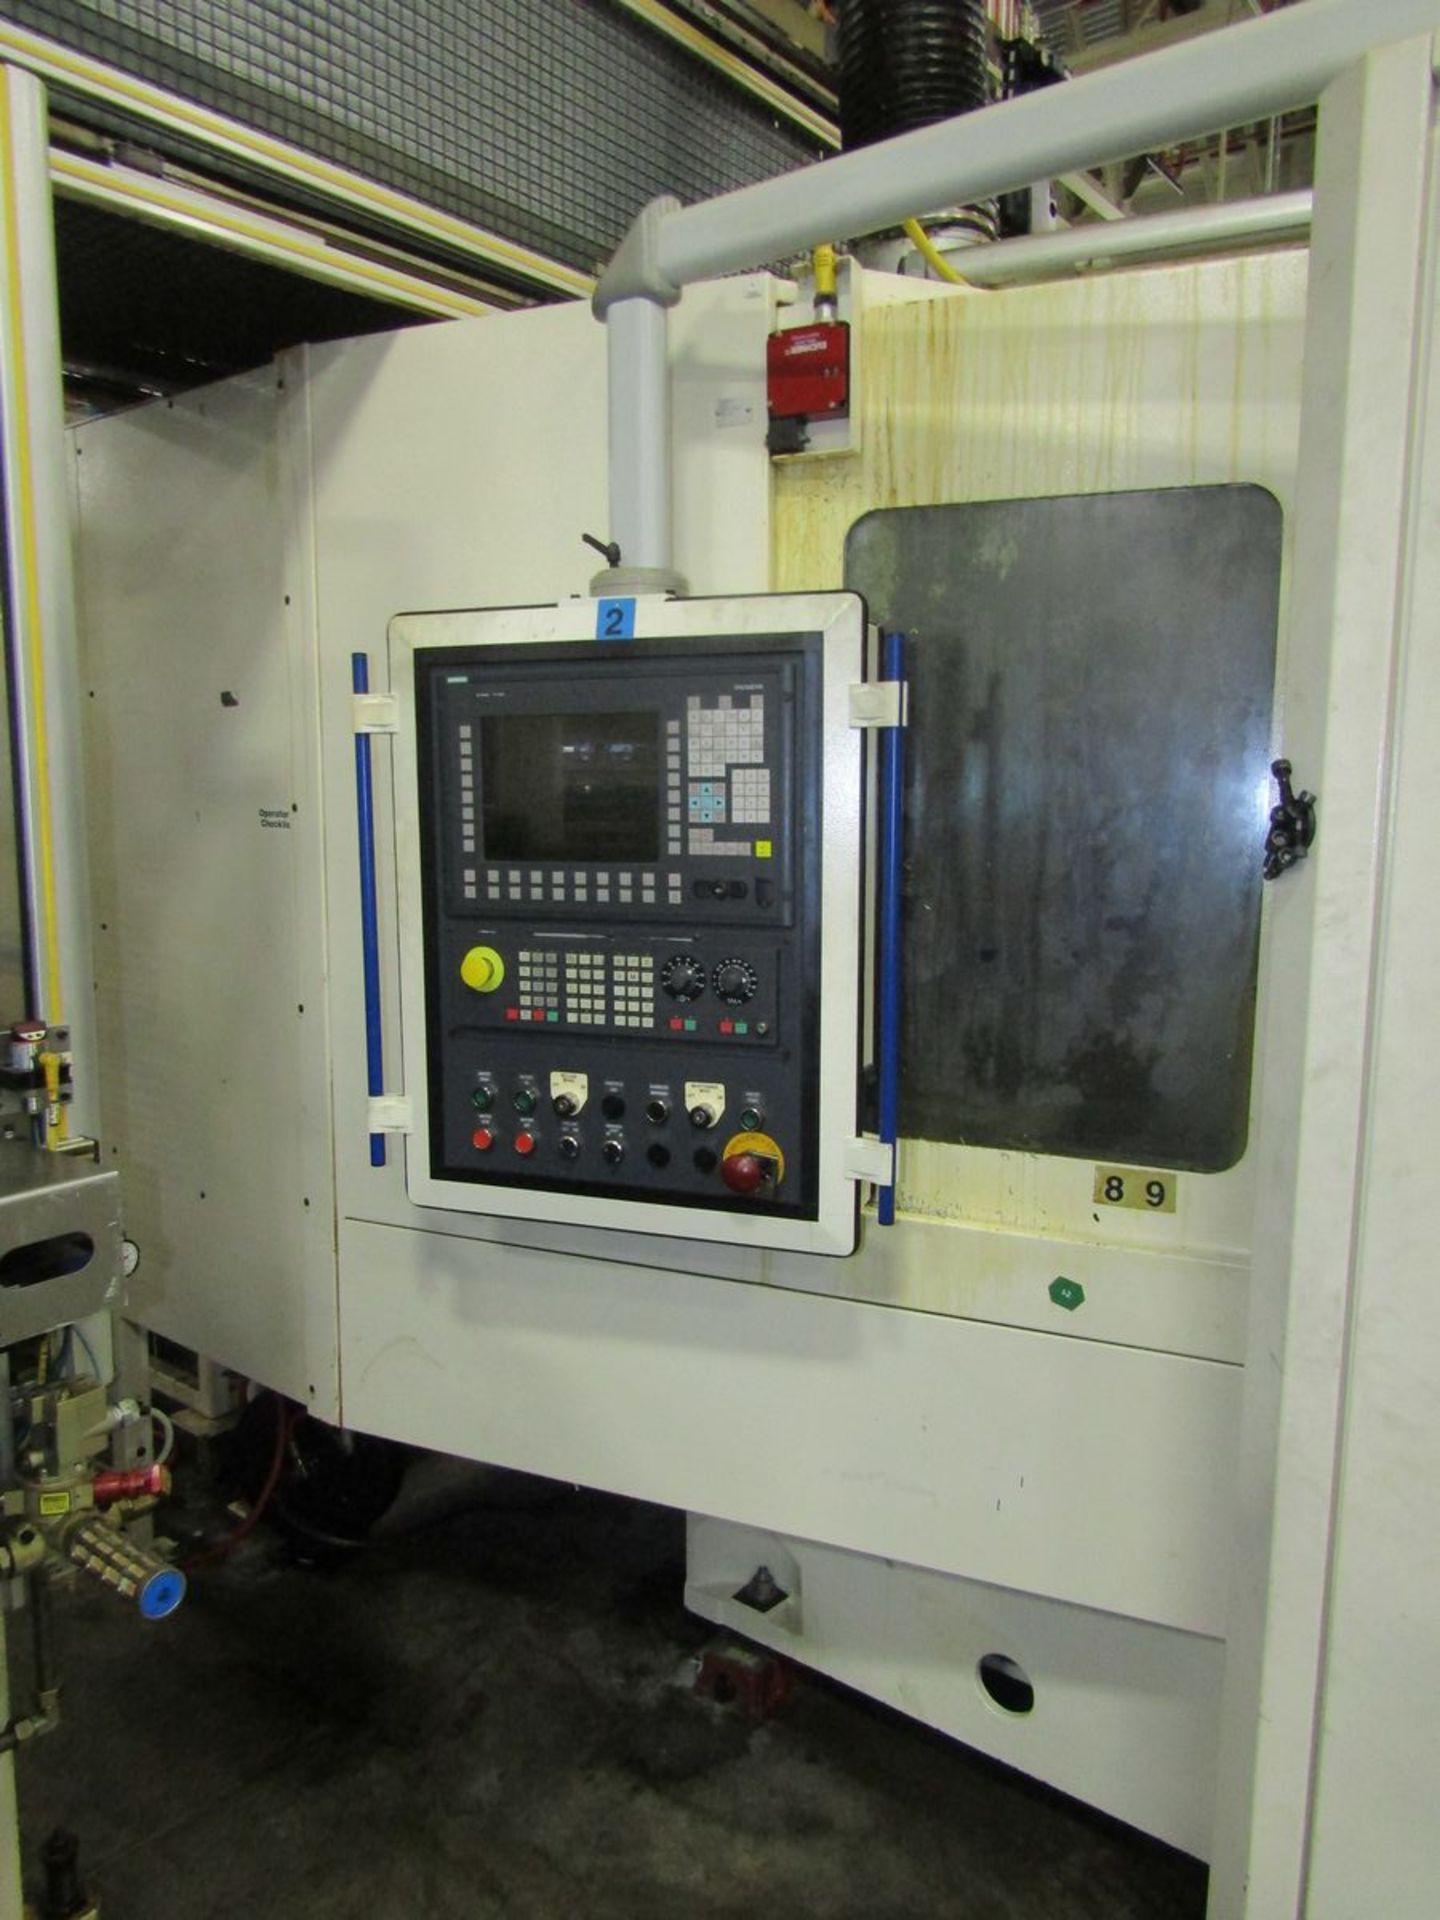 Lot 115 - 2002 Heller MC16 CNC Horizontal Machining Center